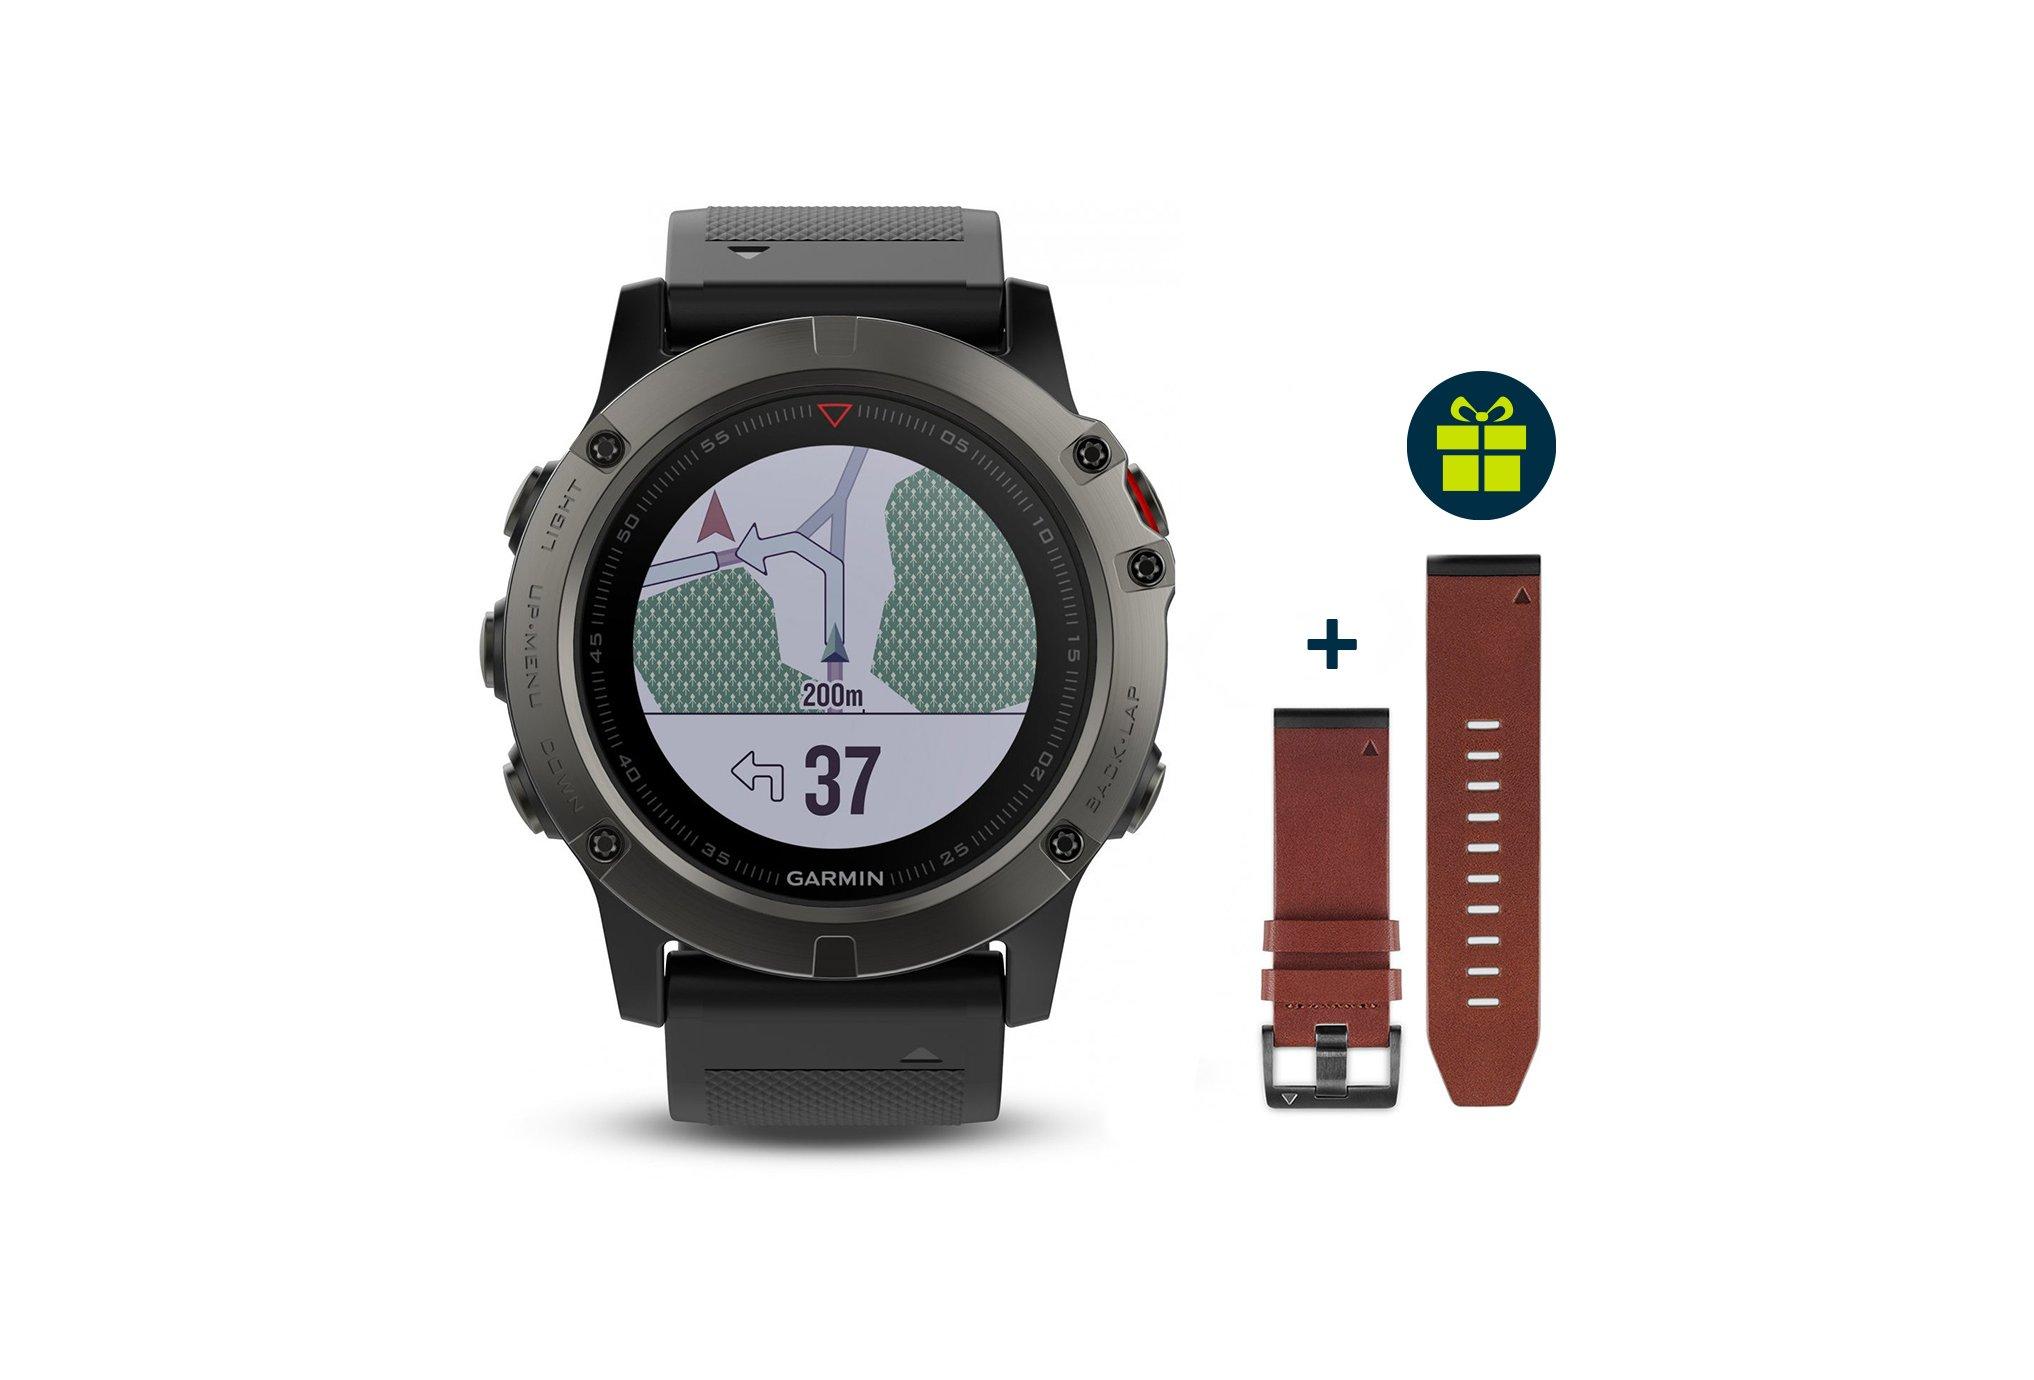 Garmin Pack Fenix 5X GPS Multisport Sapphire + Bracelet cuir QuickFit Cardio-Gps